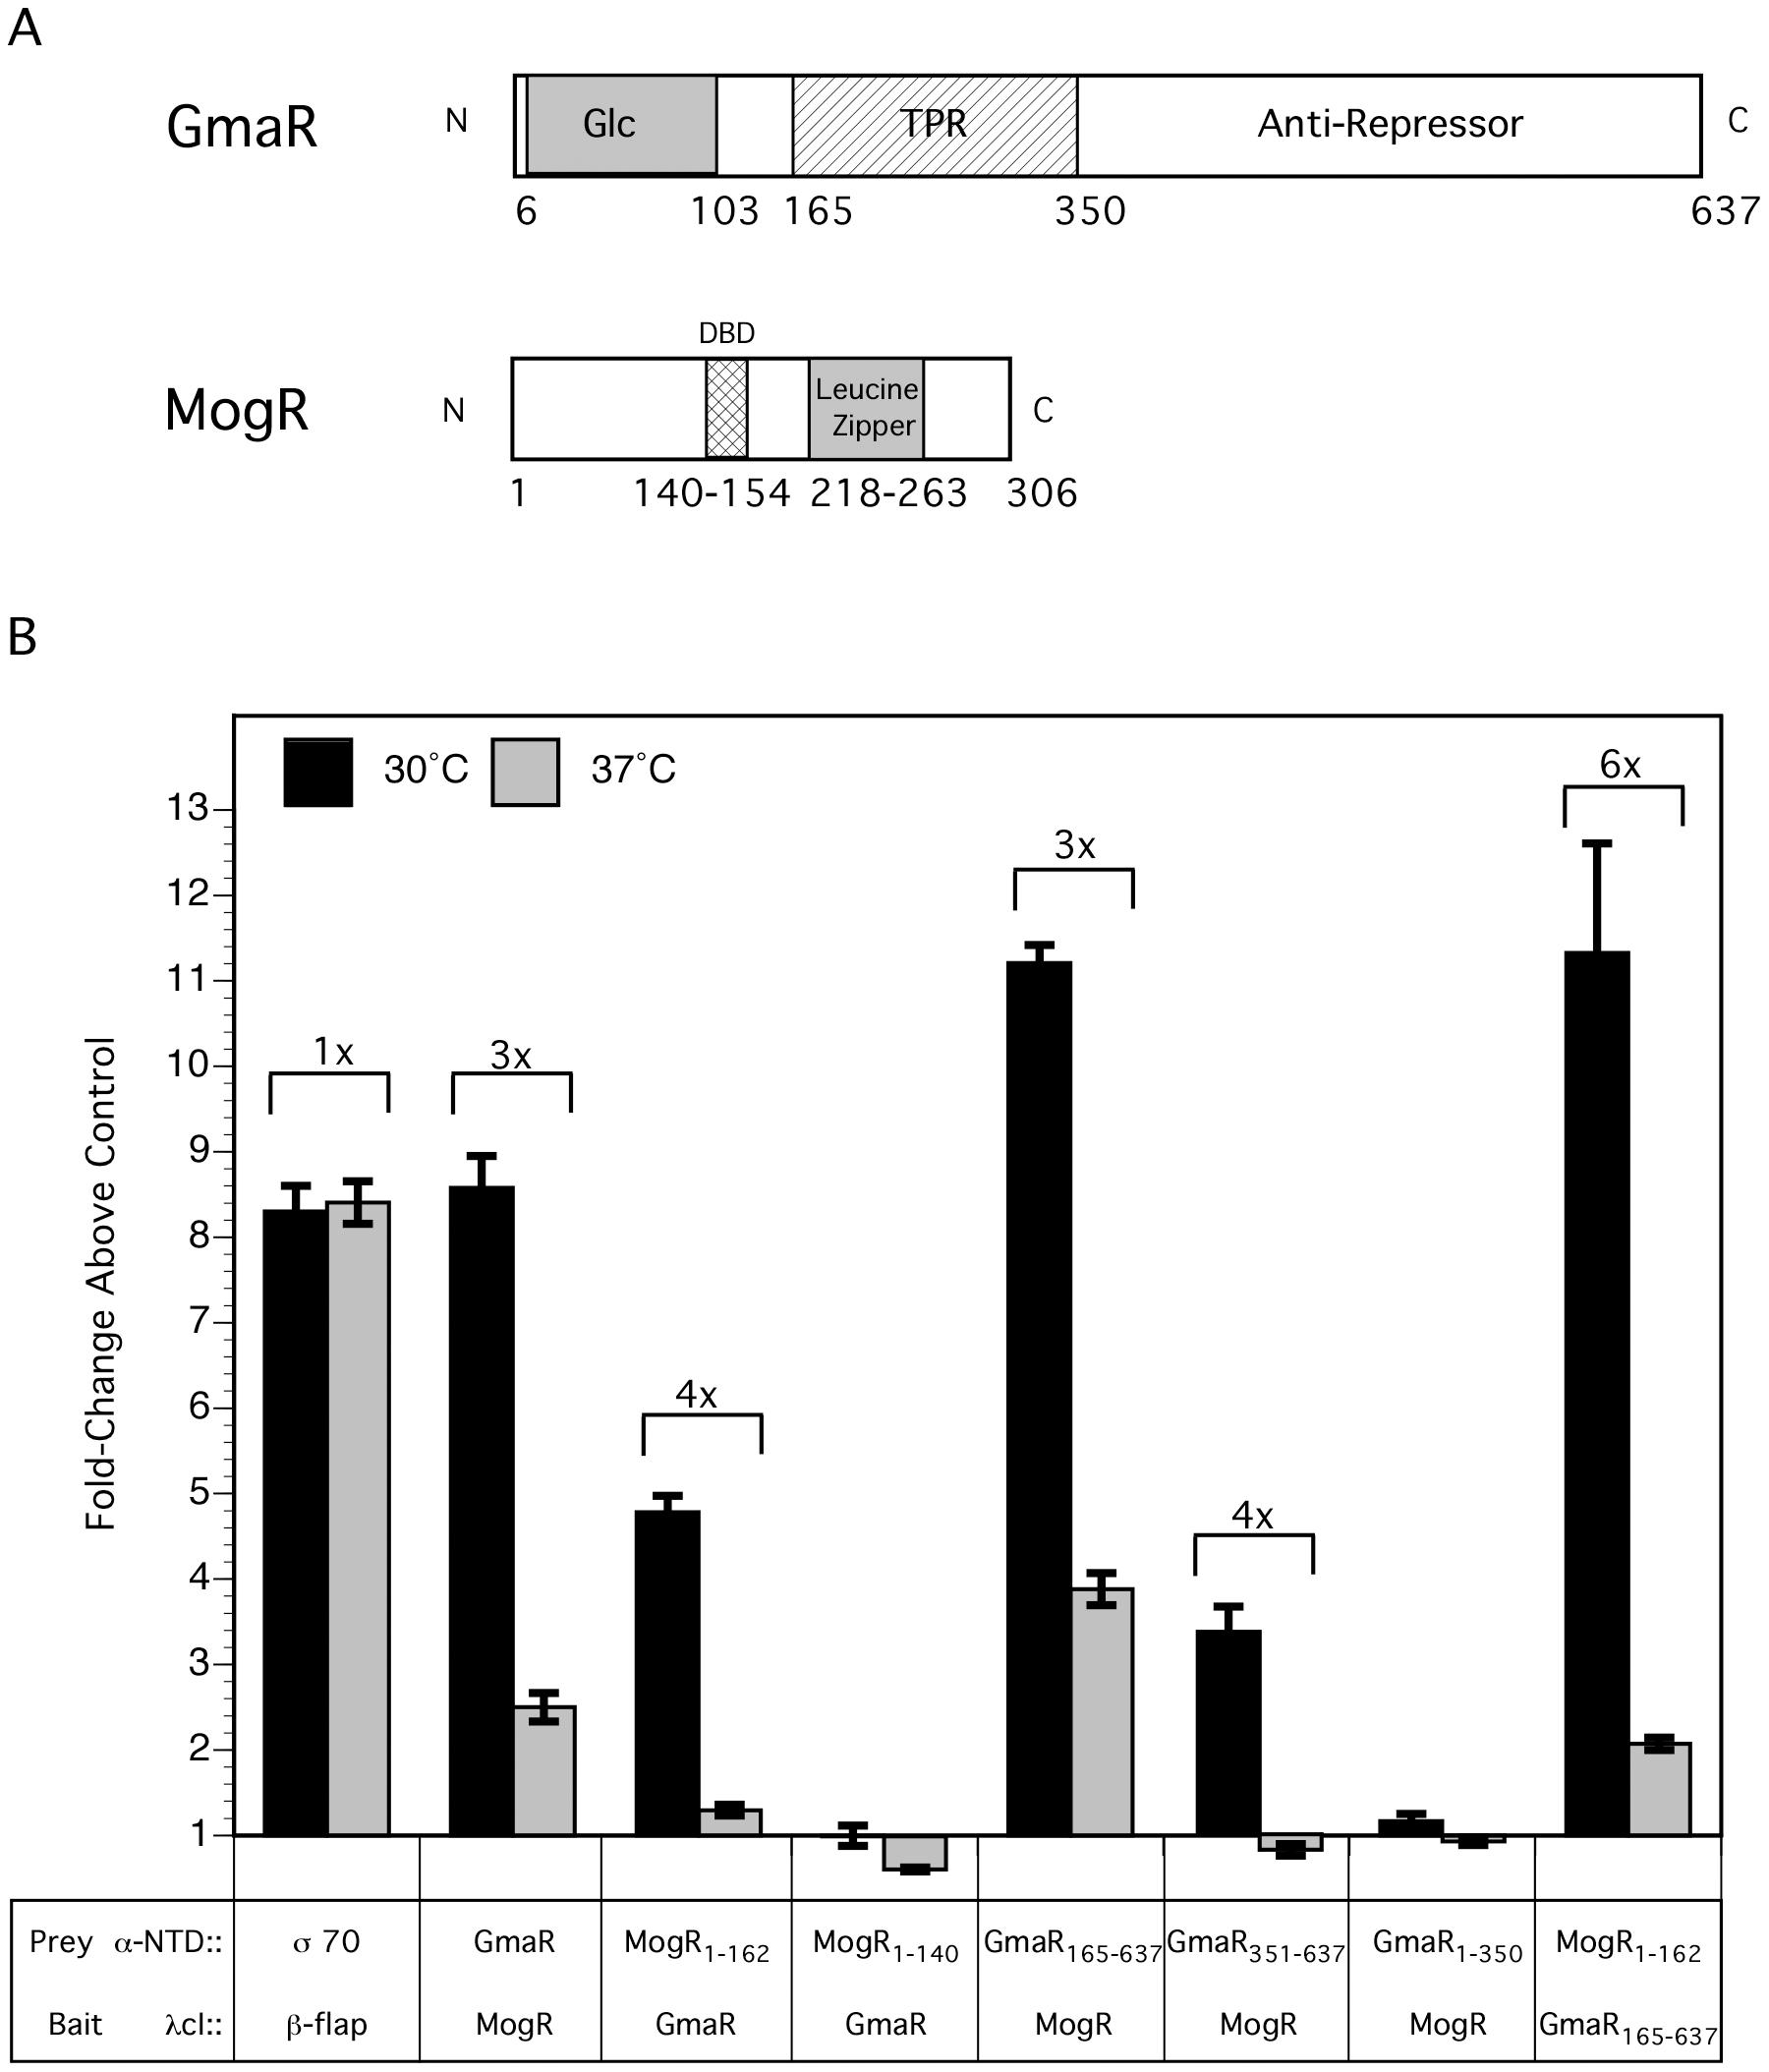 The interaction between GmaR and MogR is temperature-sensitive.